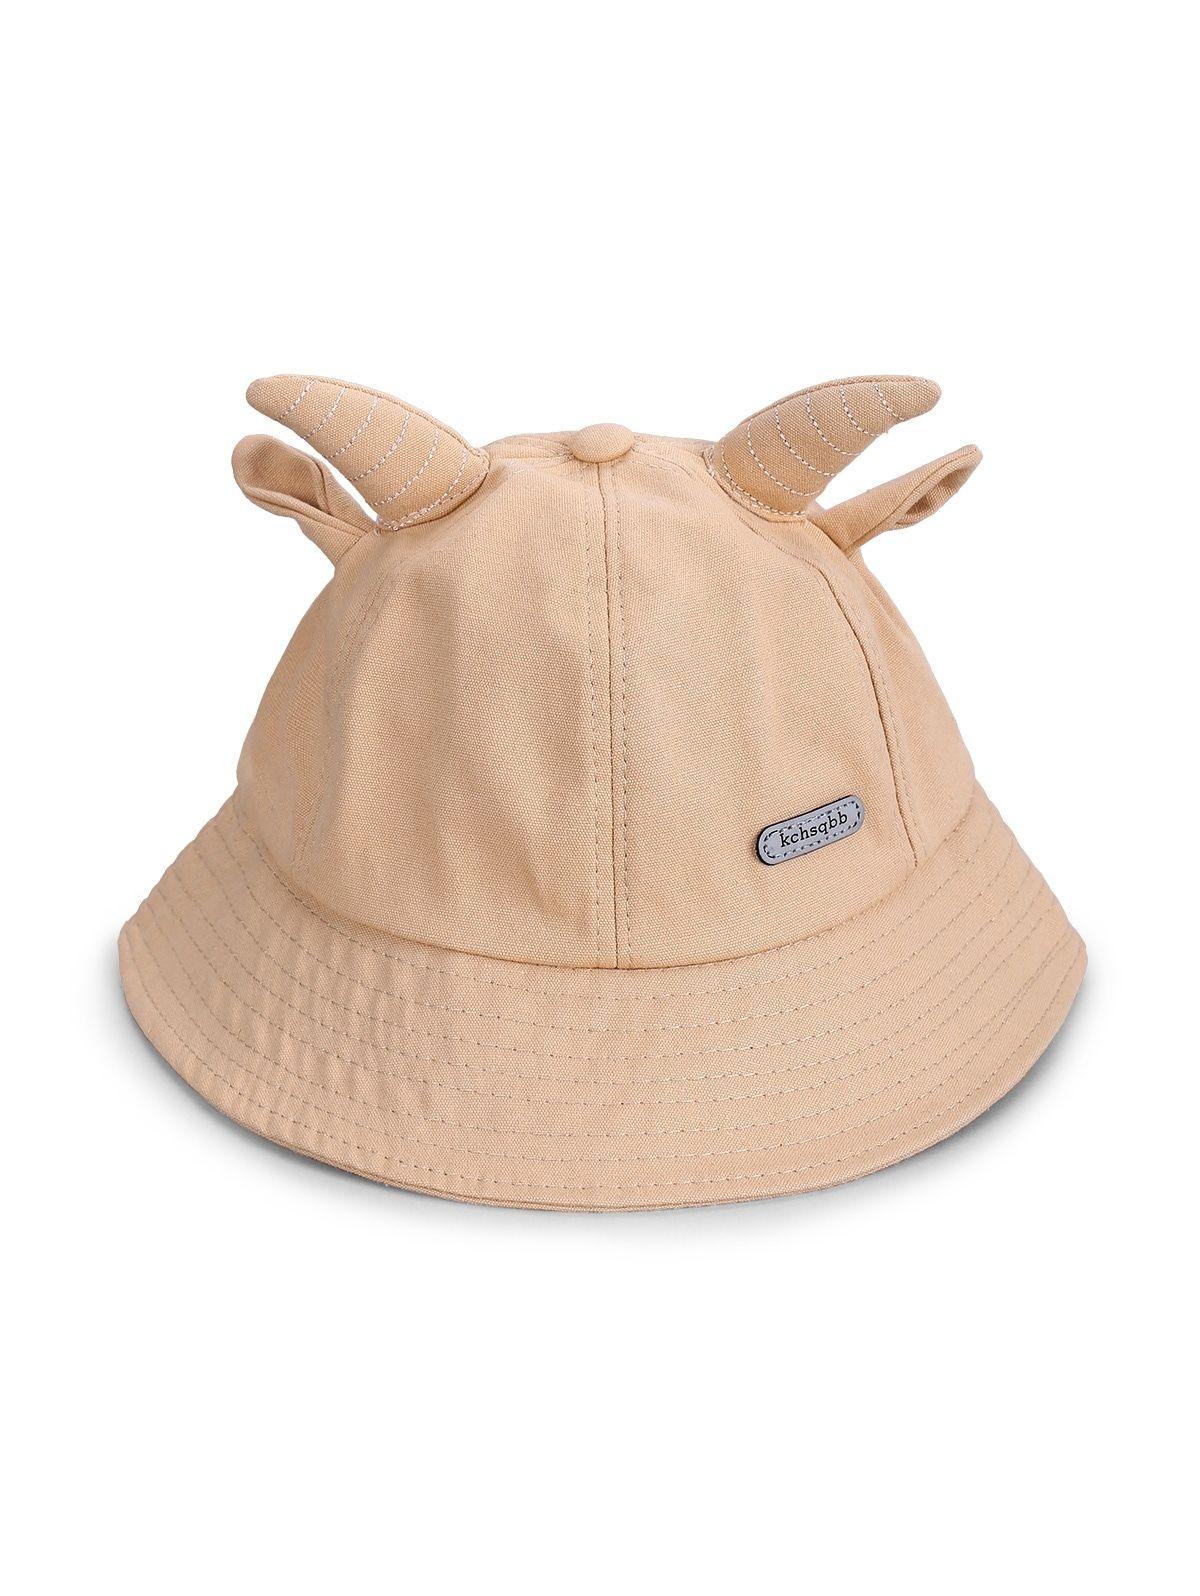 Cute Animal Ear Bucket Hats Black Light Khaki Tangerine Yellow Bucket Hat Black Animal Ears Hat Types